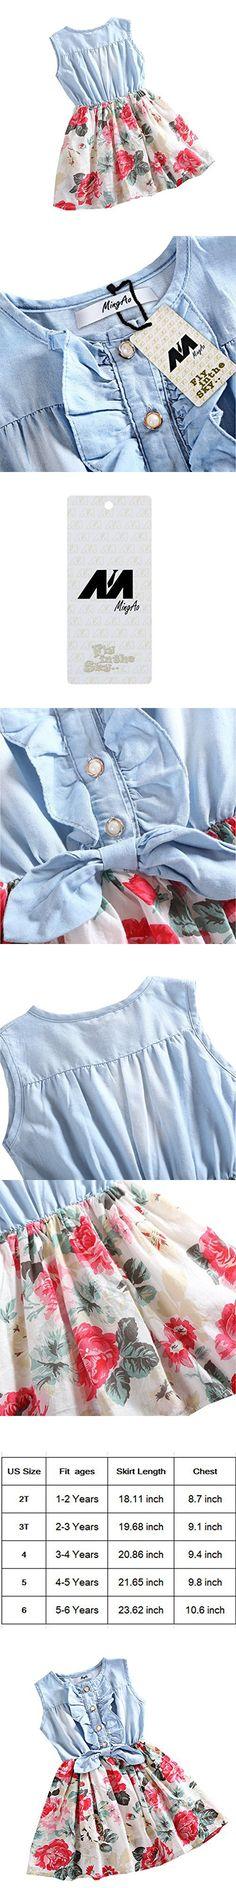 Mingao Little Girls Denim Floral Print Sleeveless Skirt Dresses 2-3 Years